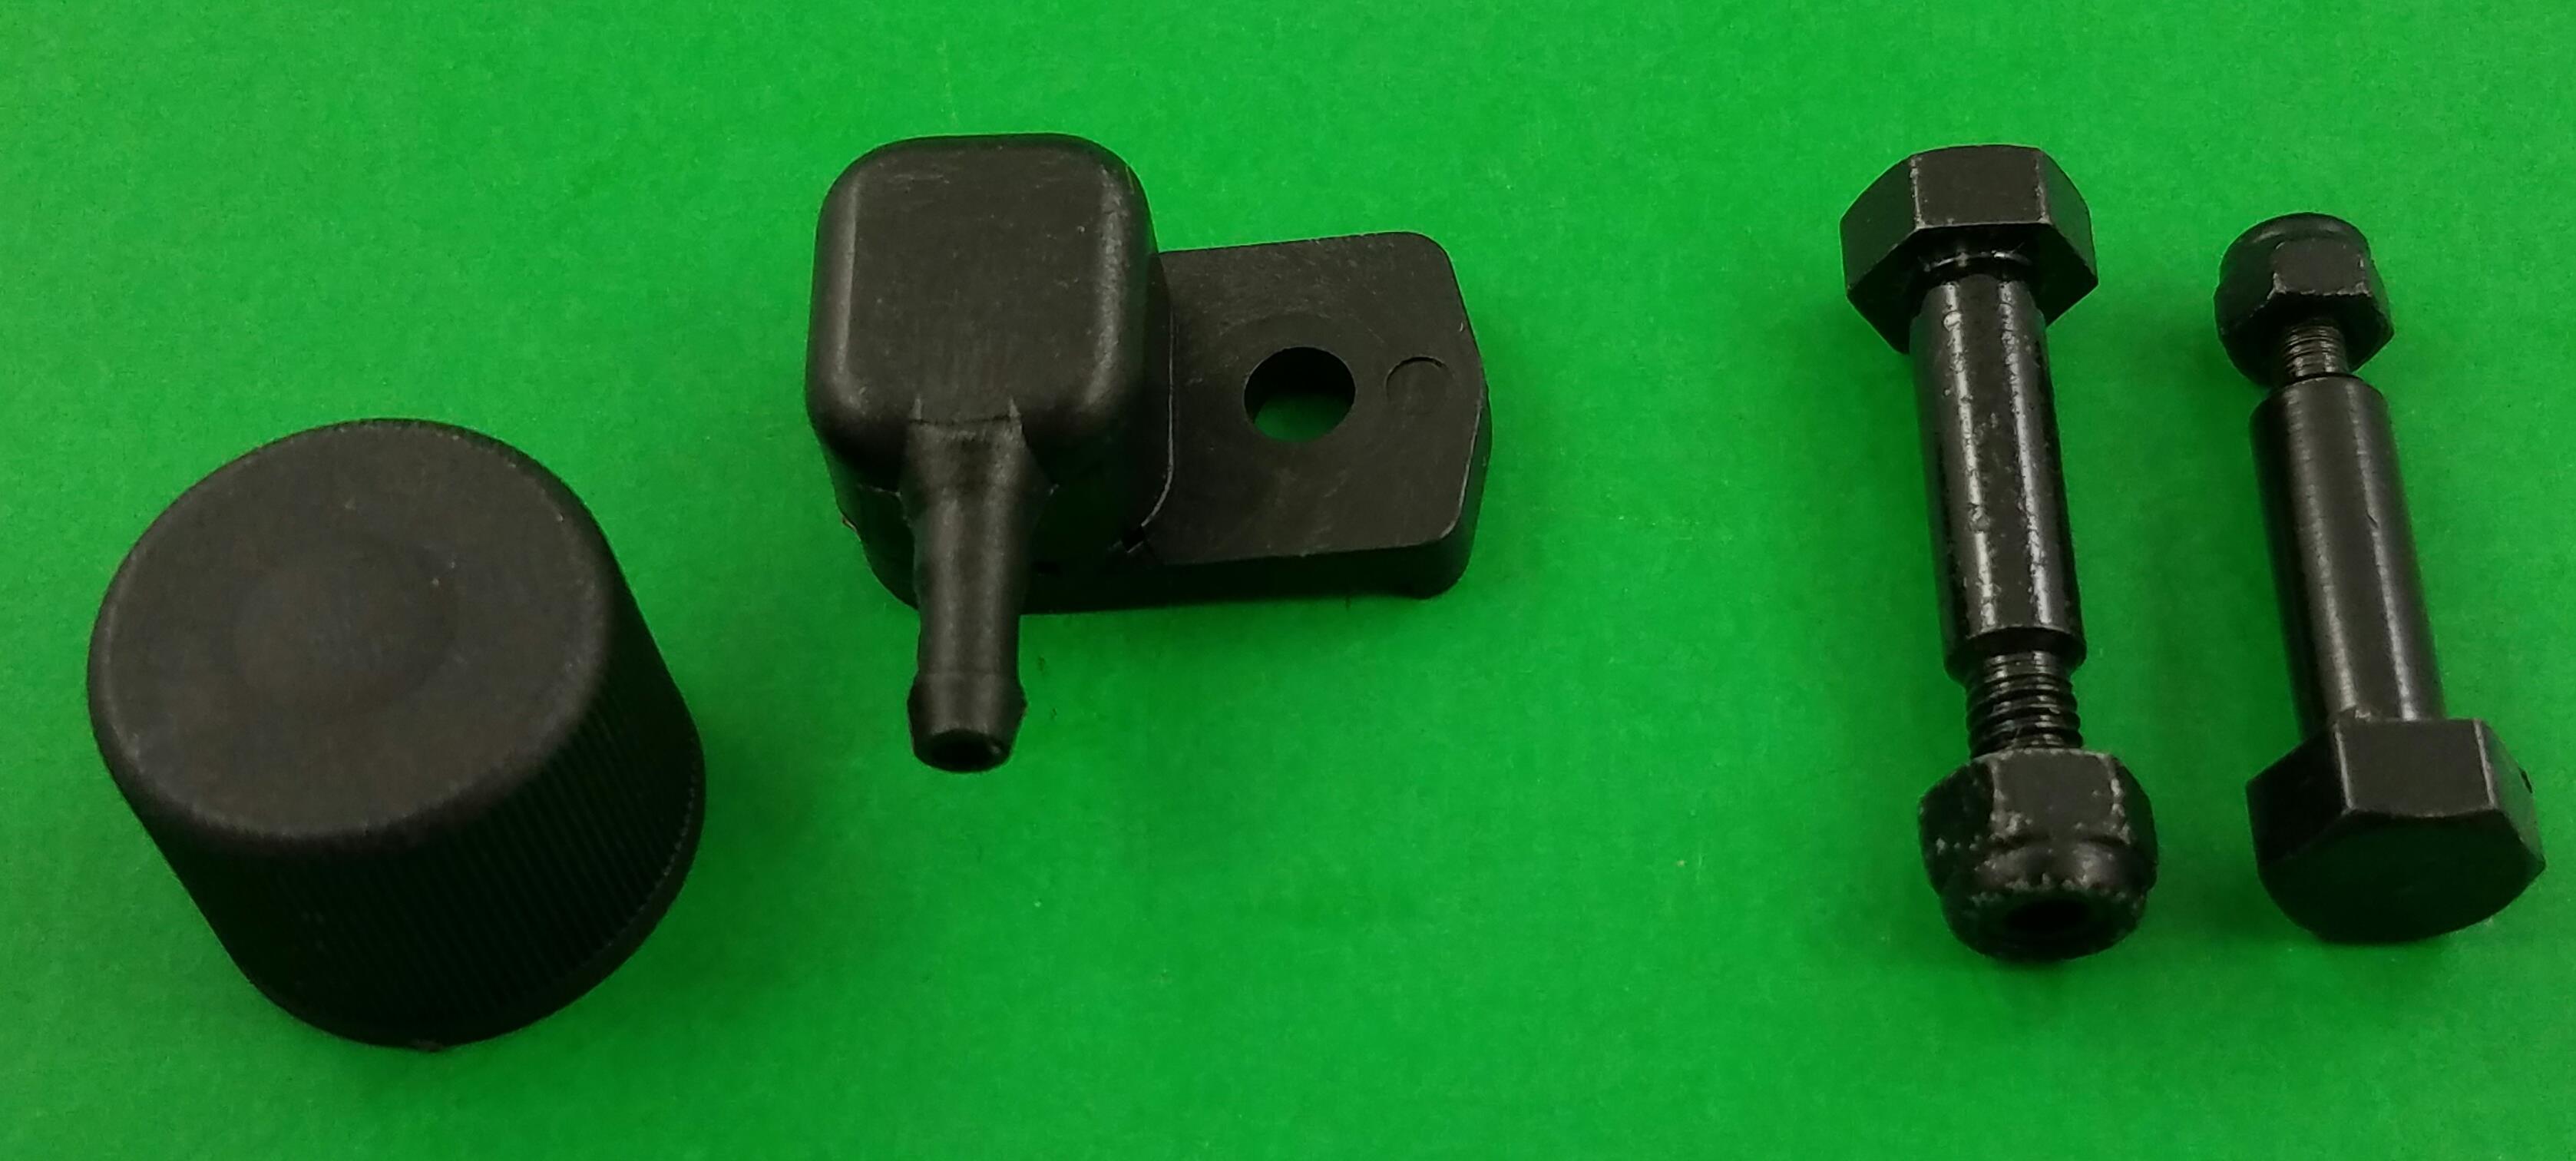 Winnebago 01 701 Windshield Washer Nozzle Kit